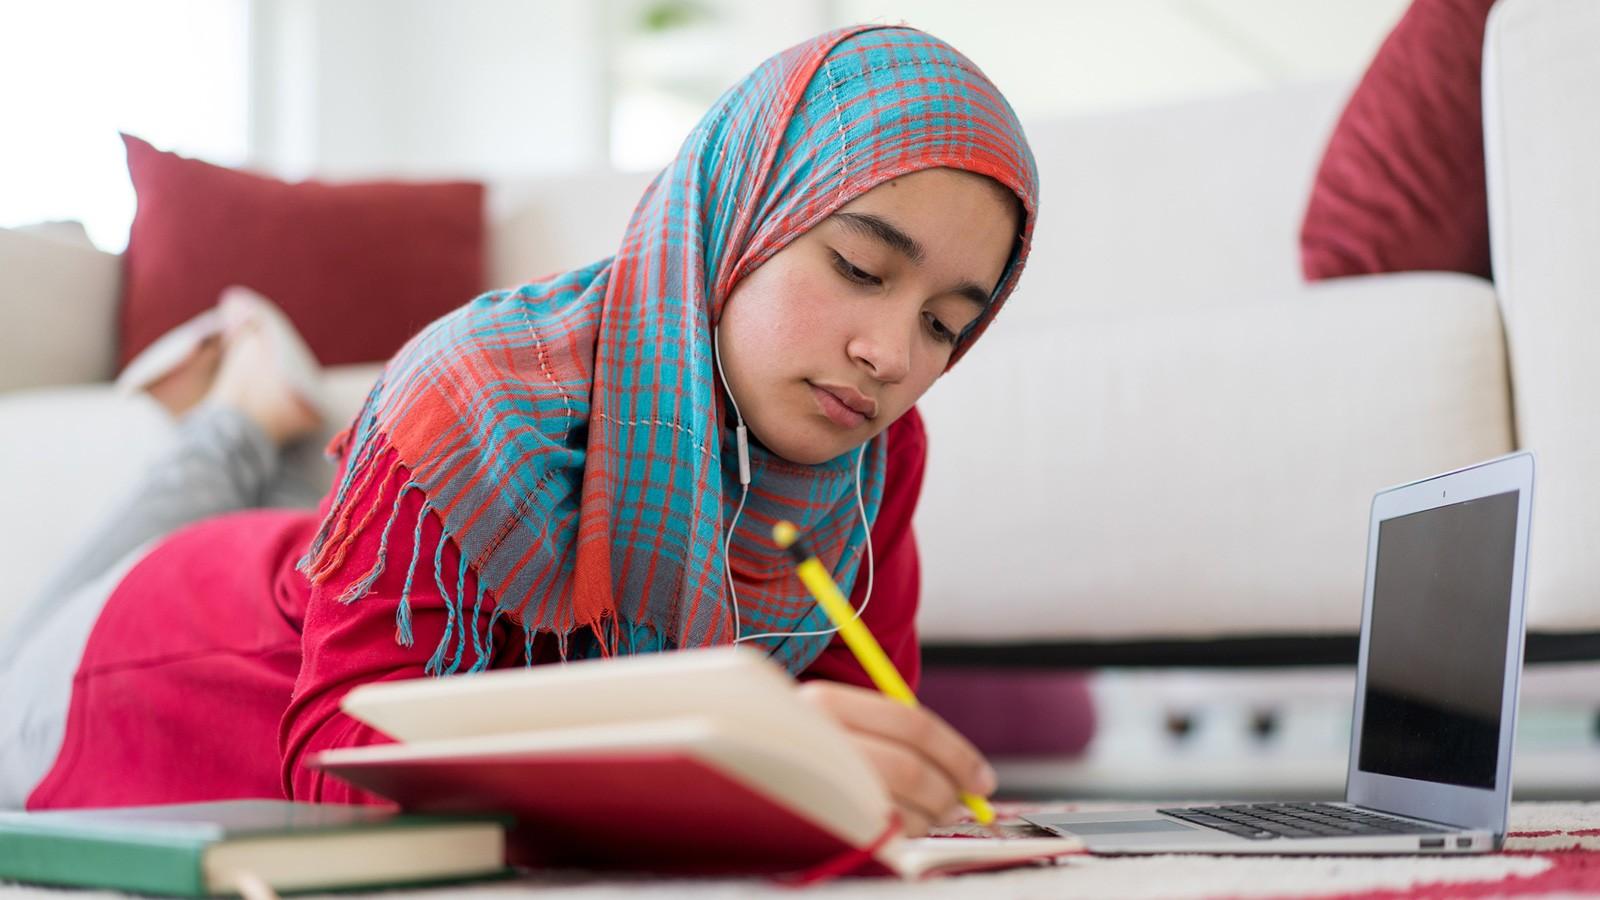 girl analyzing a poem